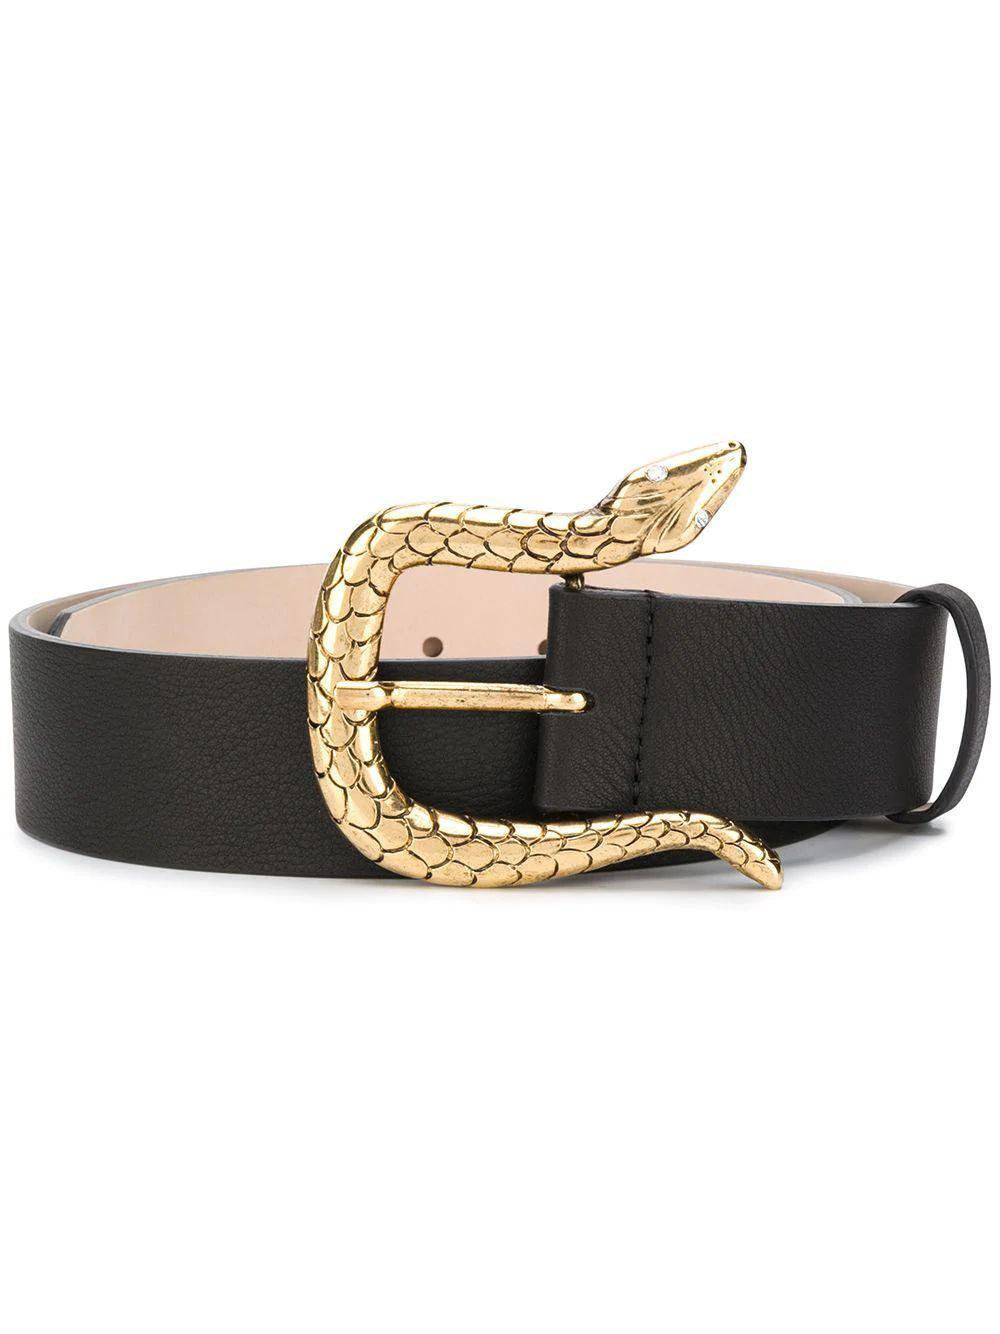 Mamba Snake Waist Belt Item # BW521-000LE